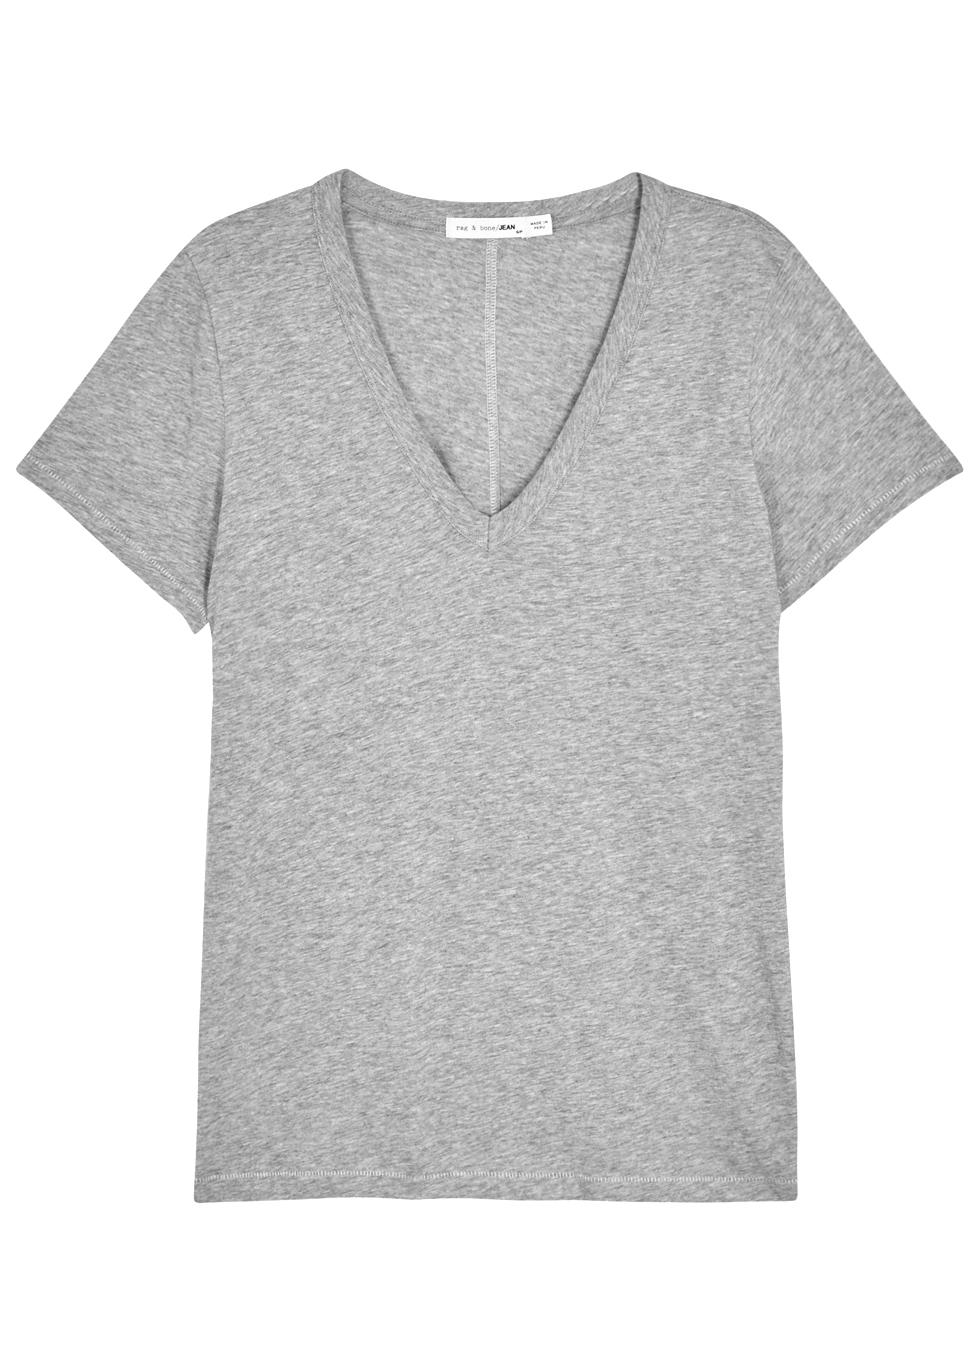 The Vee grey cotton T-shirt - rag & bone